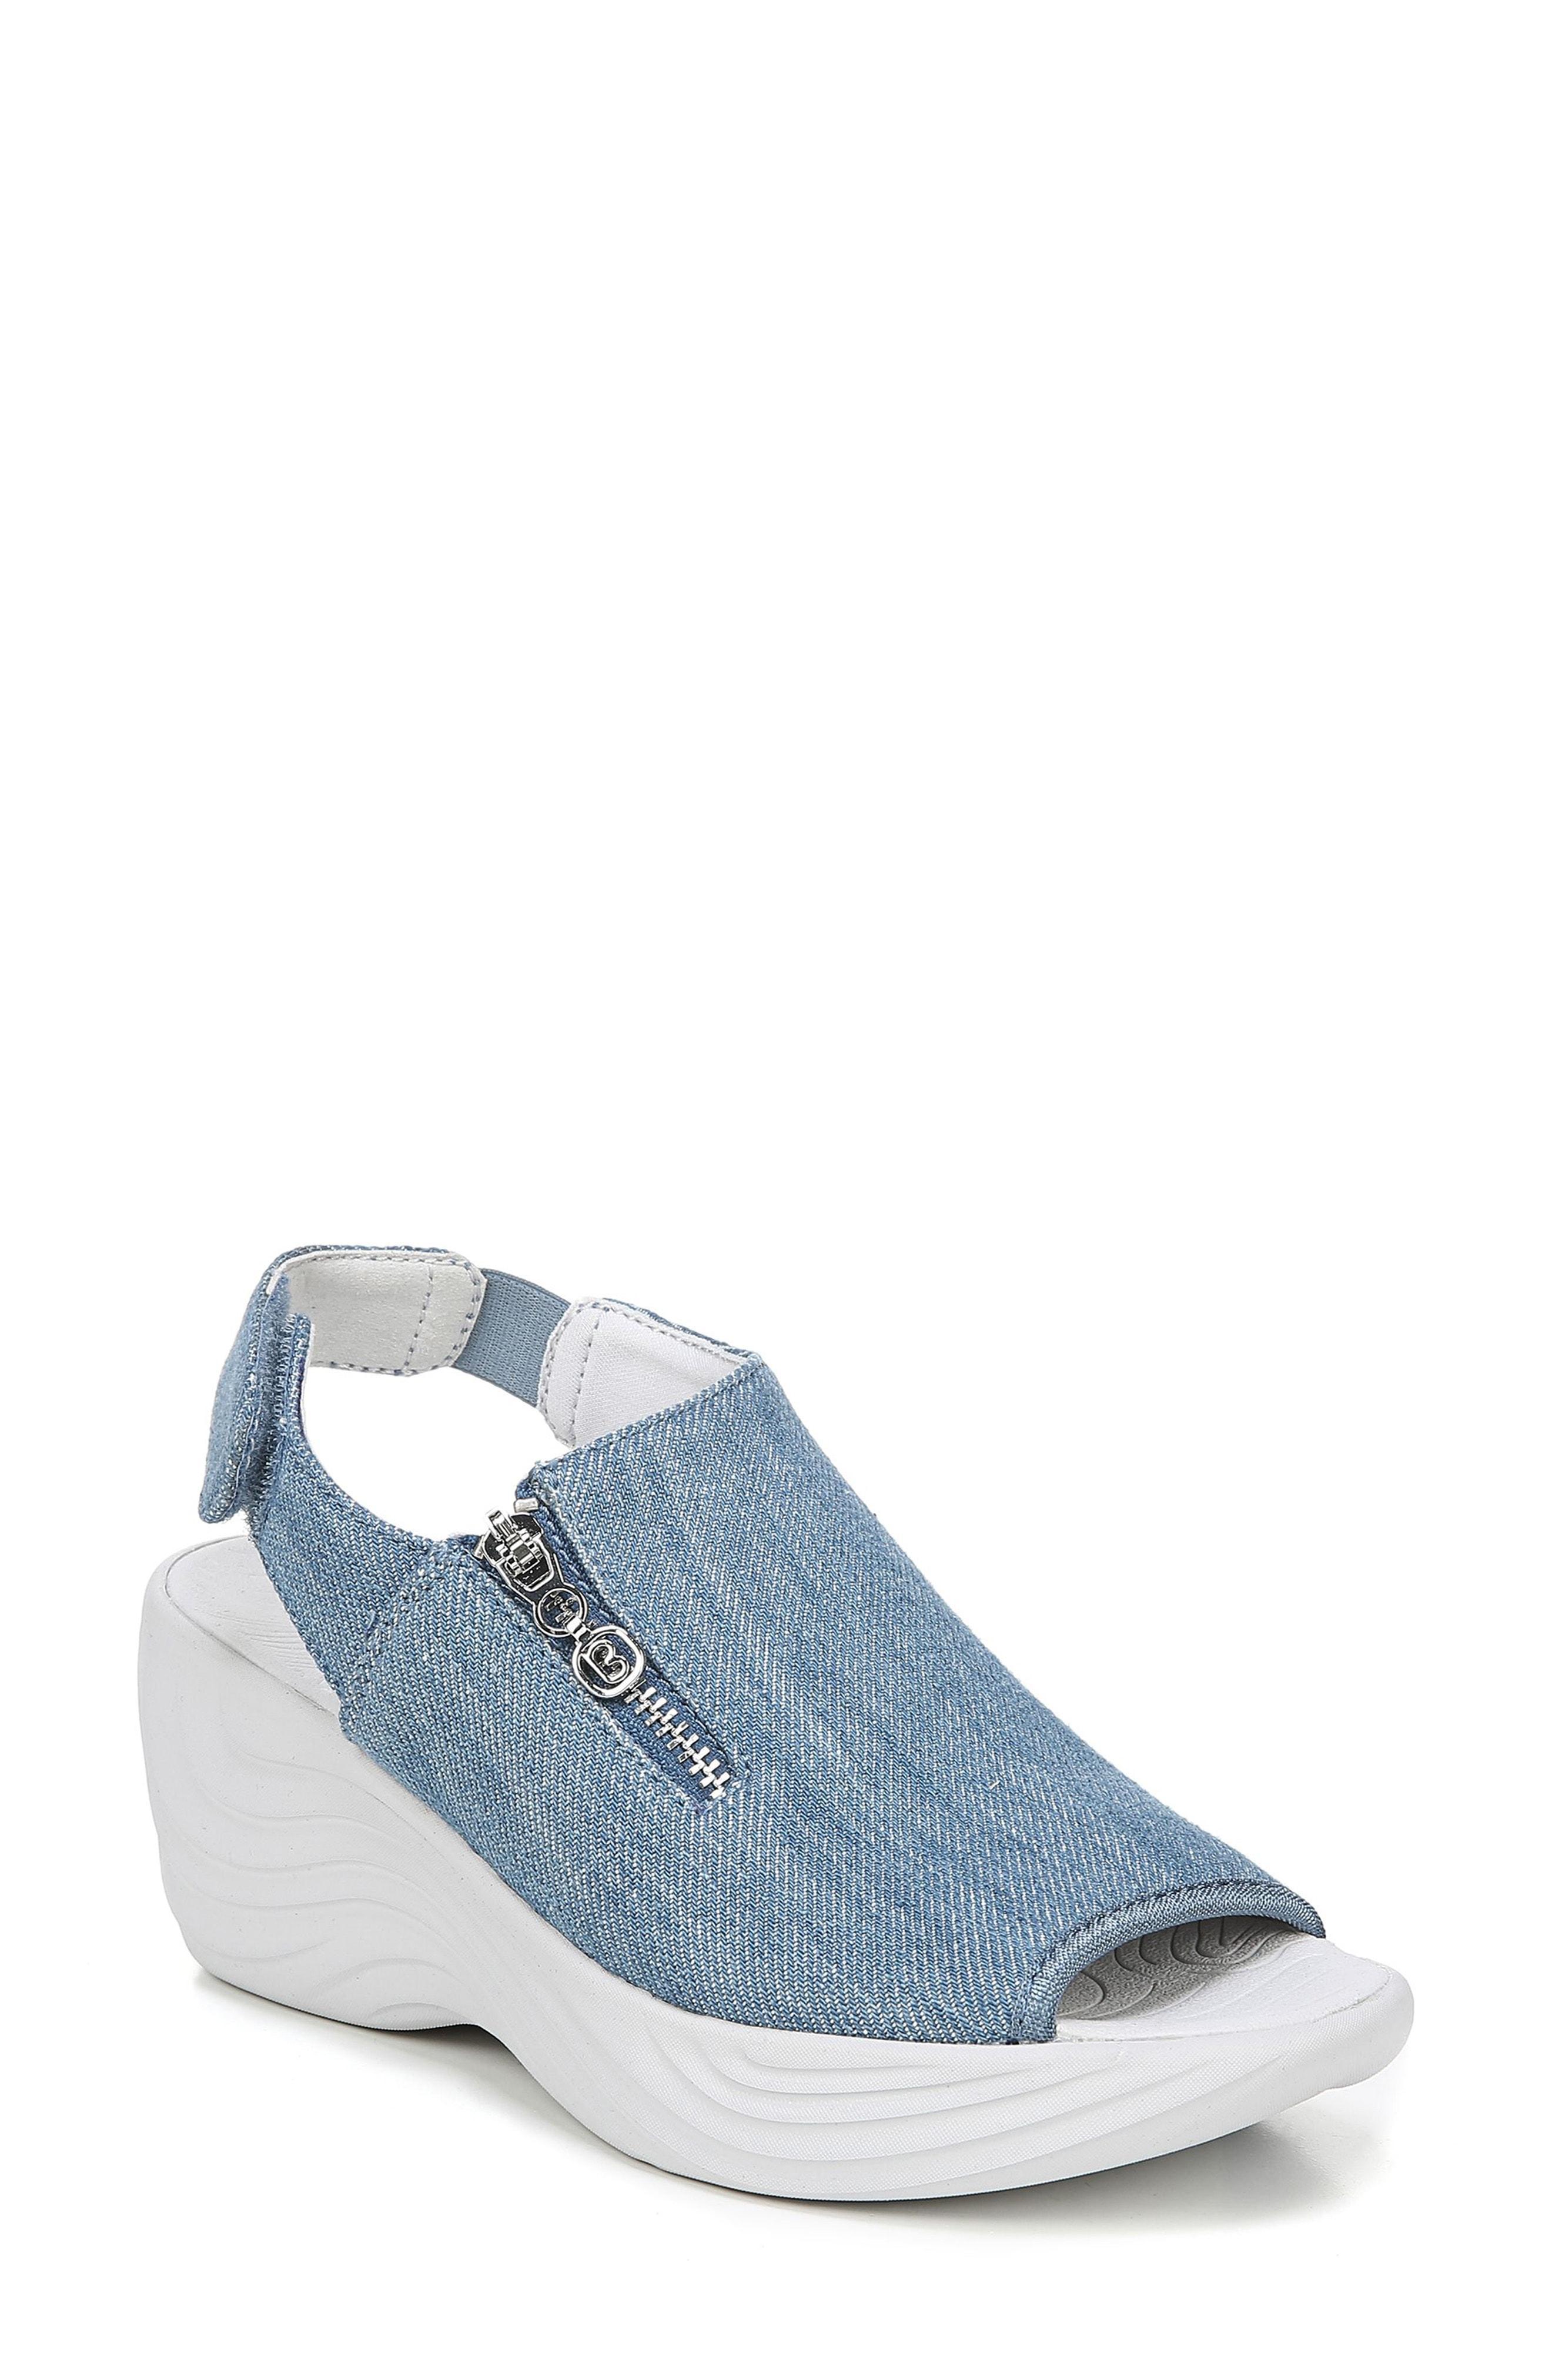 469183b4e8fe Lyst - Bzees Zipline Wedge Sandal in Blue - Save 1%